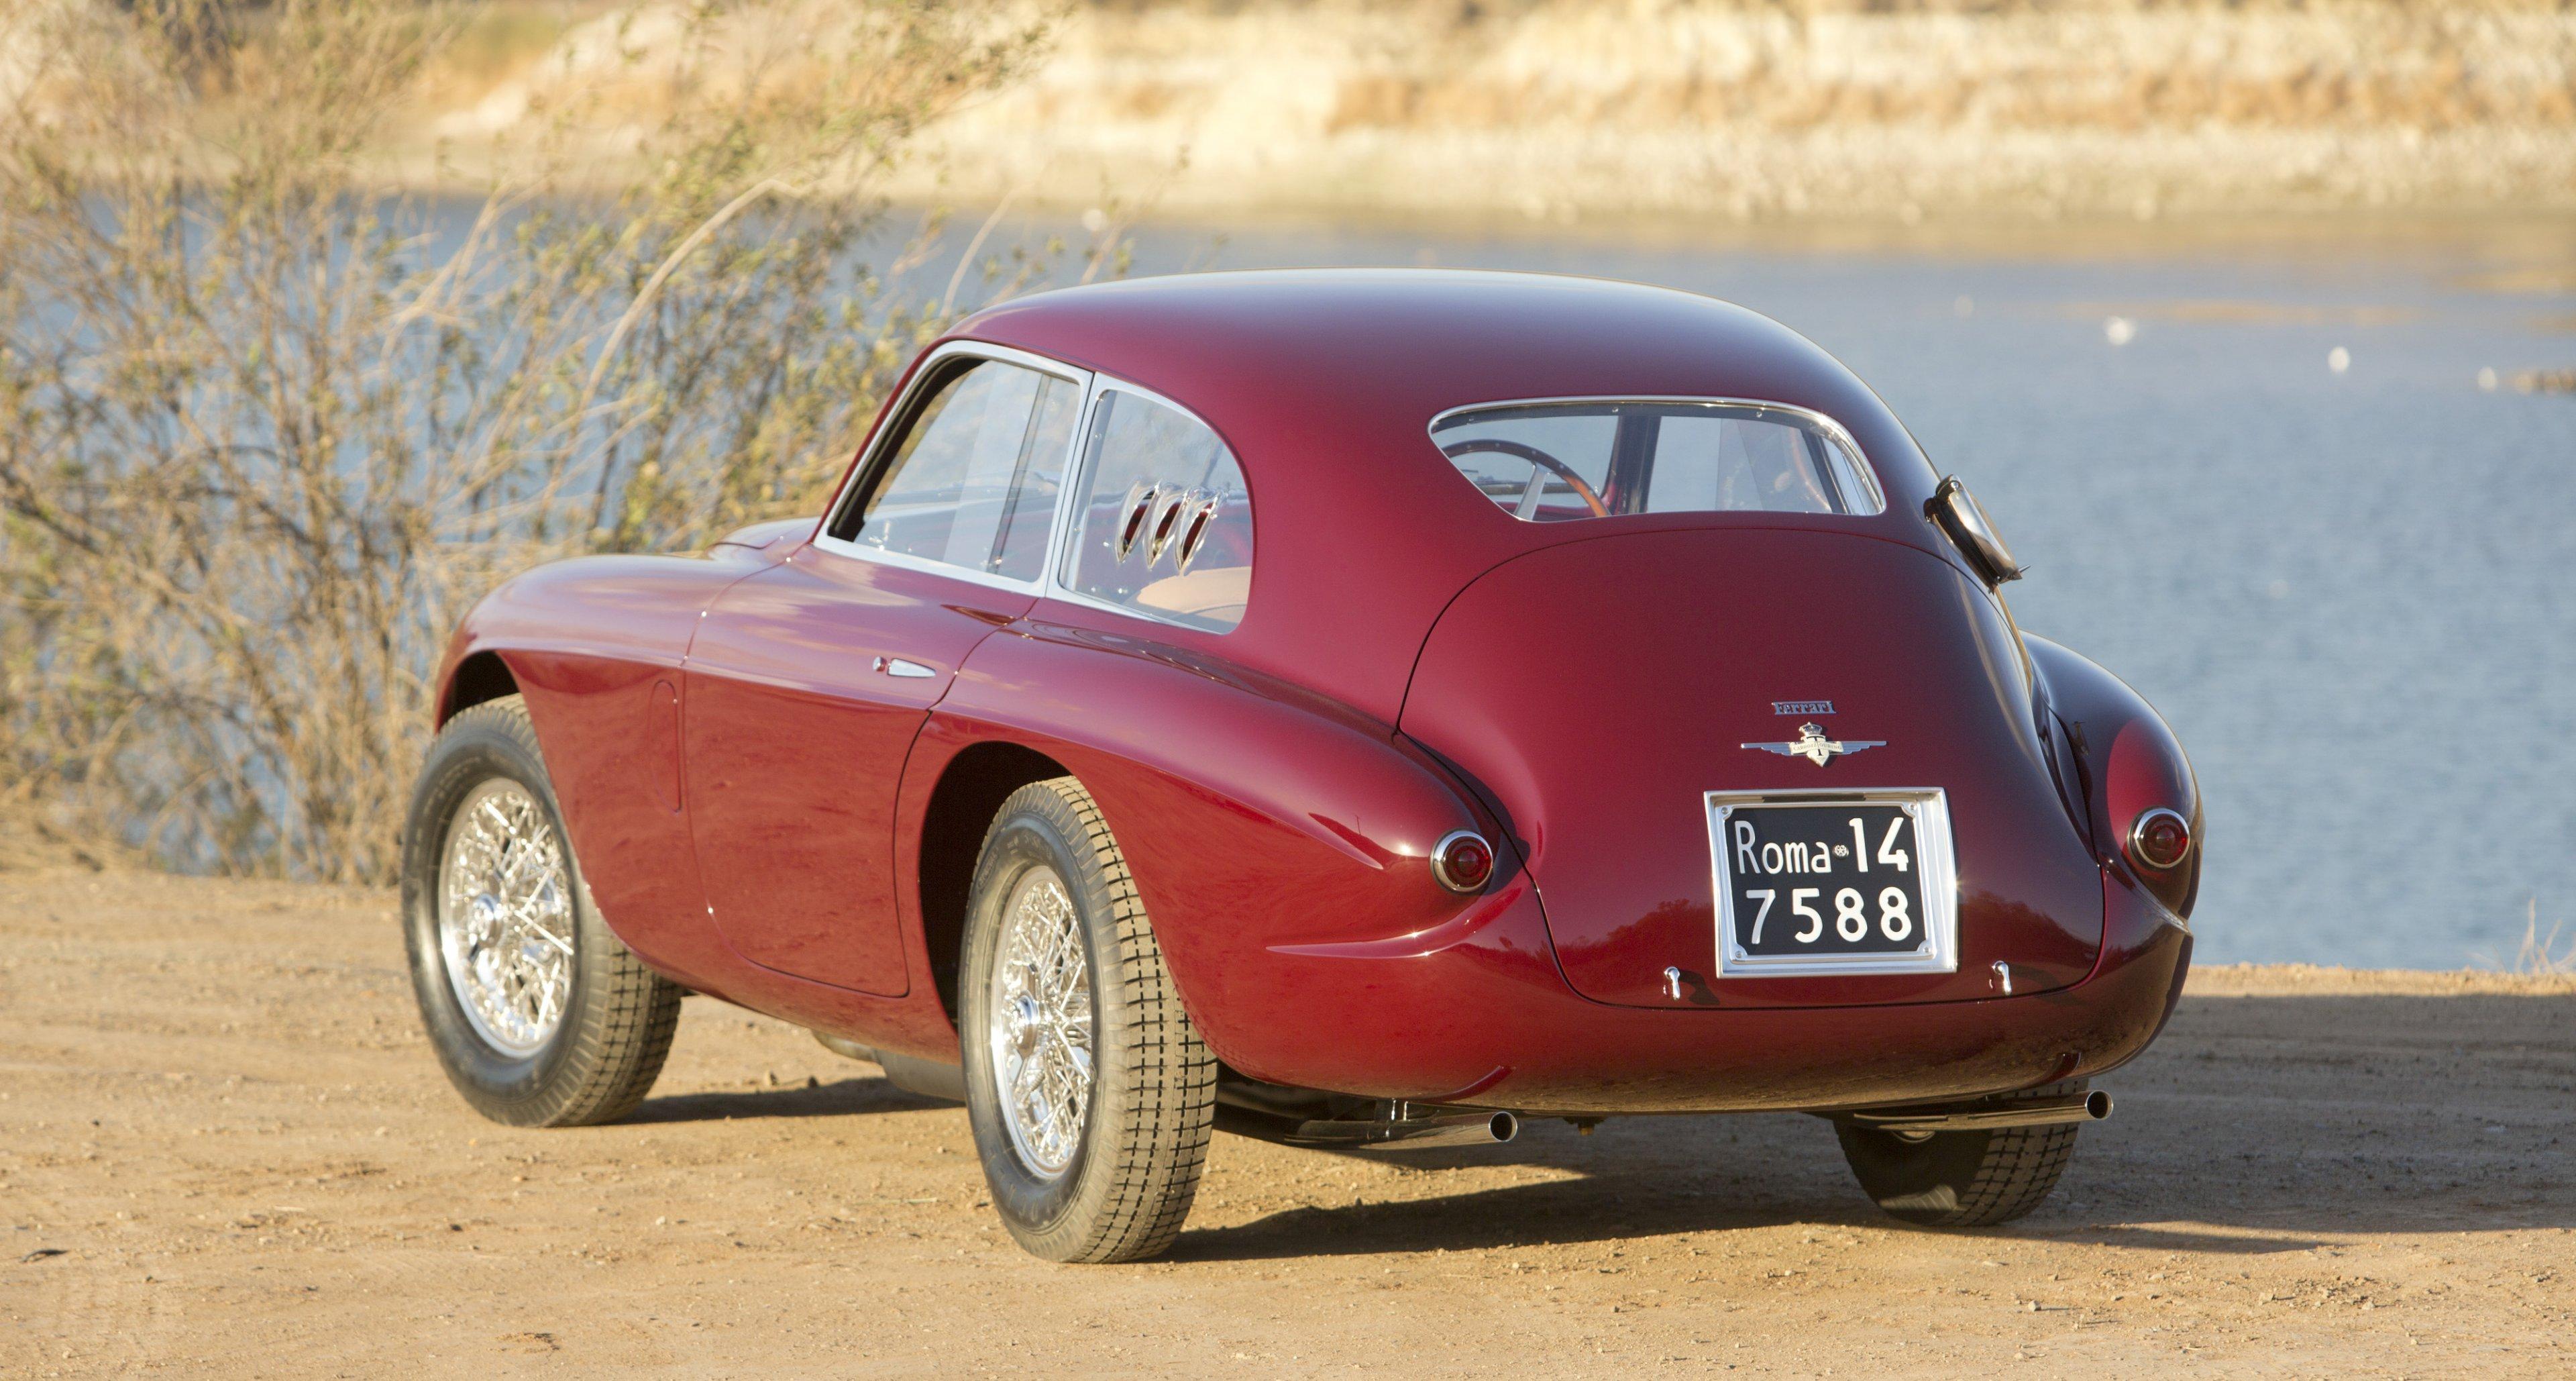 1951 Ferrari 212 Export Berlinetta 'The Tailor's Car' sold by Bonhams for $3,190,000